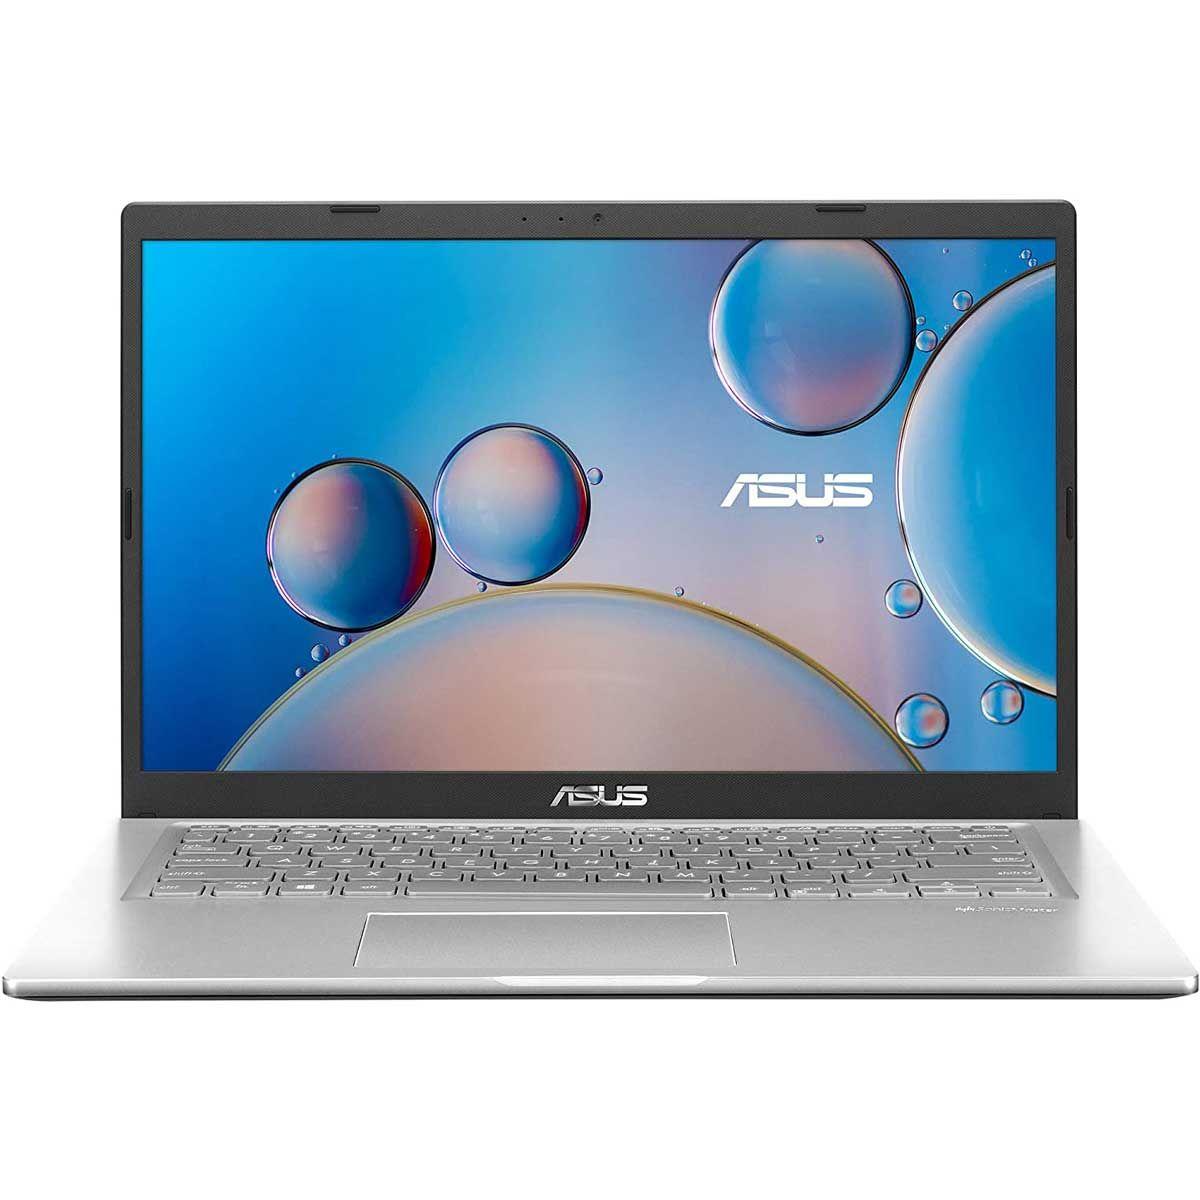 ASUS VivoBook 14 11th Gen Core i3-1115G4 (2021)